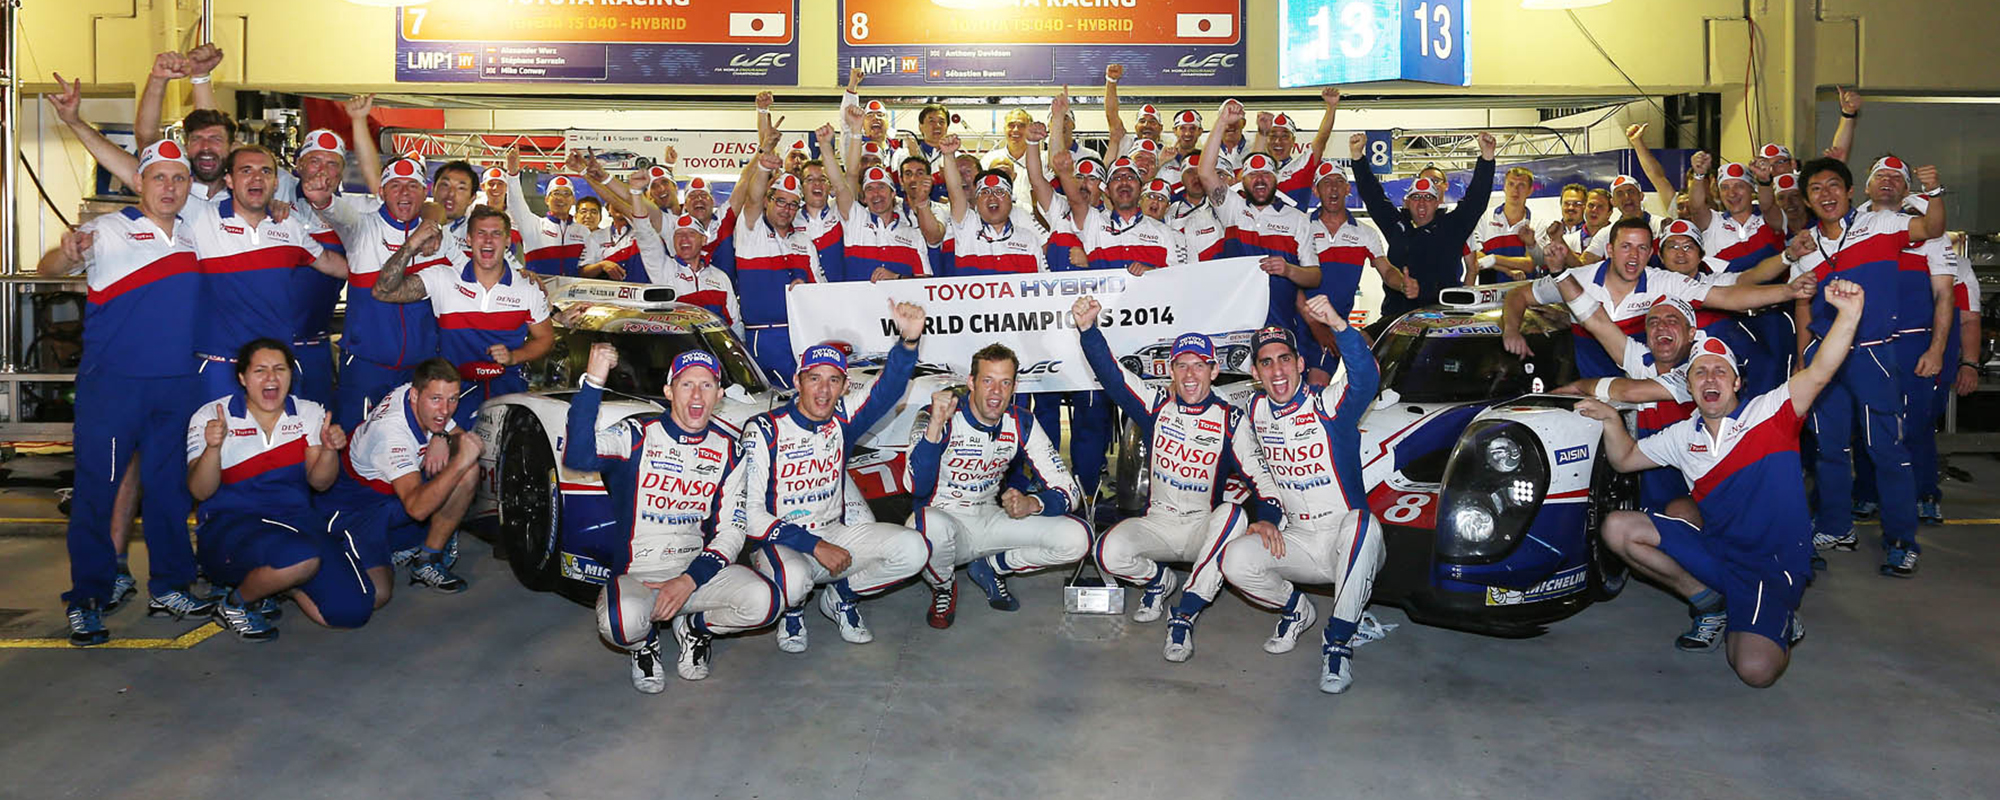 Toyota kampioen met de TS040 HYBRID in FIA World Endurance Championship